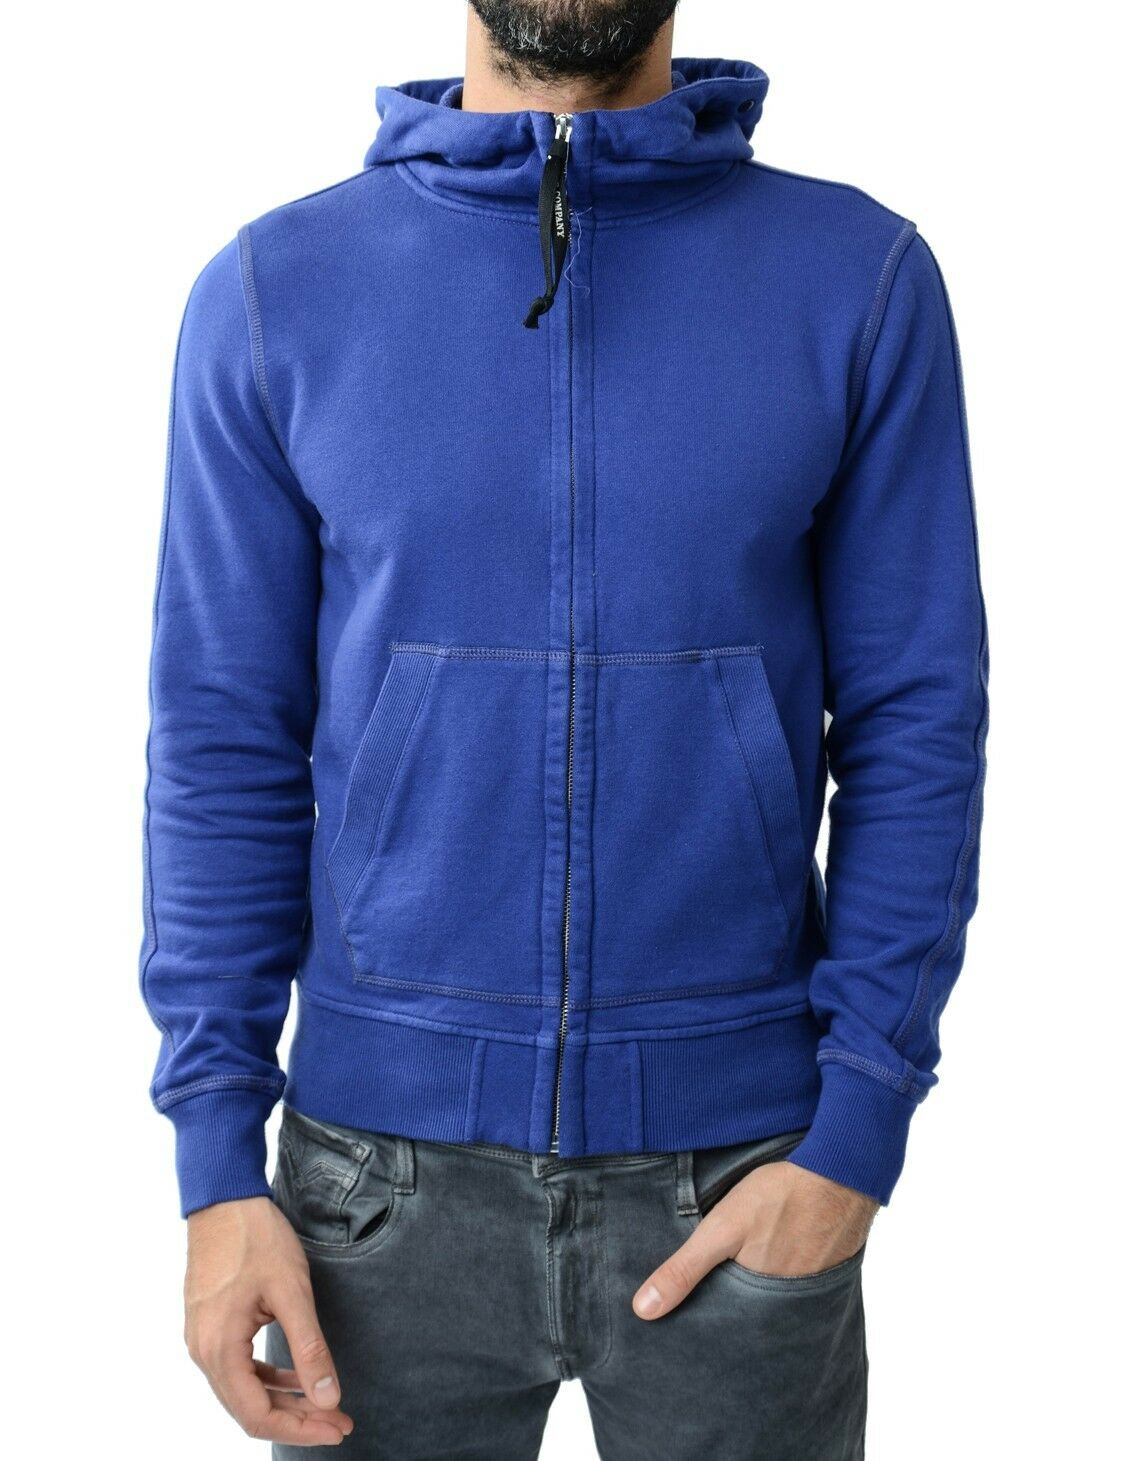 CP Company Goggle Hooded Sweatshirt Royal Royal Royal Blau  | Billiger als der Preis  28bff0